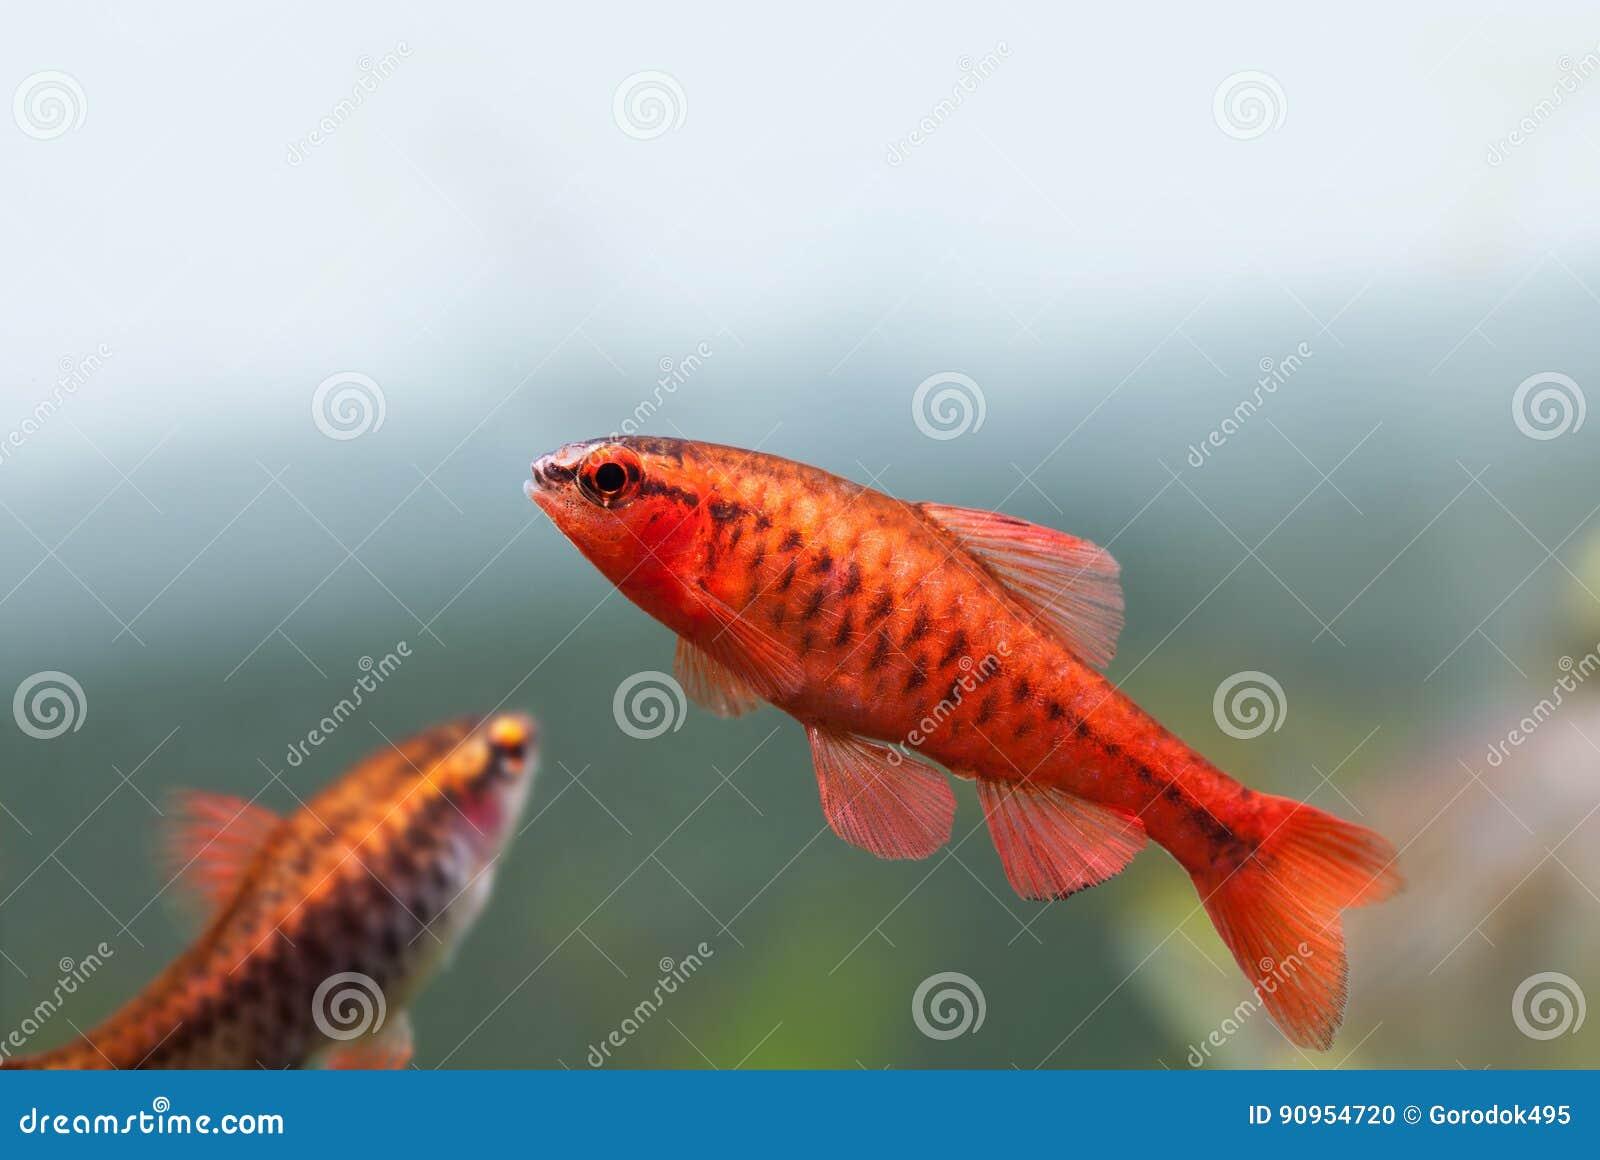 Colorful Exotic Fish Close-up. Freshwater Aquarium Tank With Barbus ...